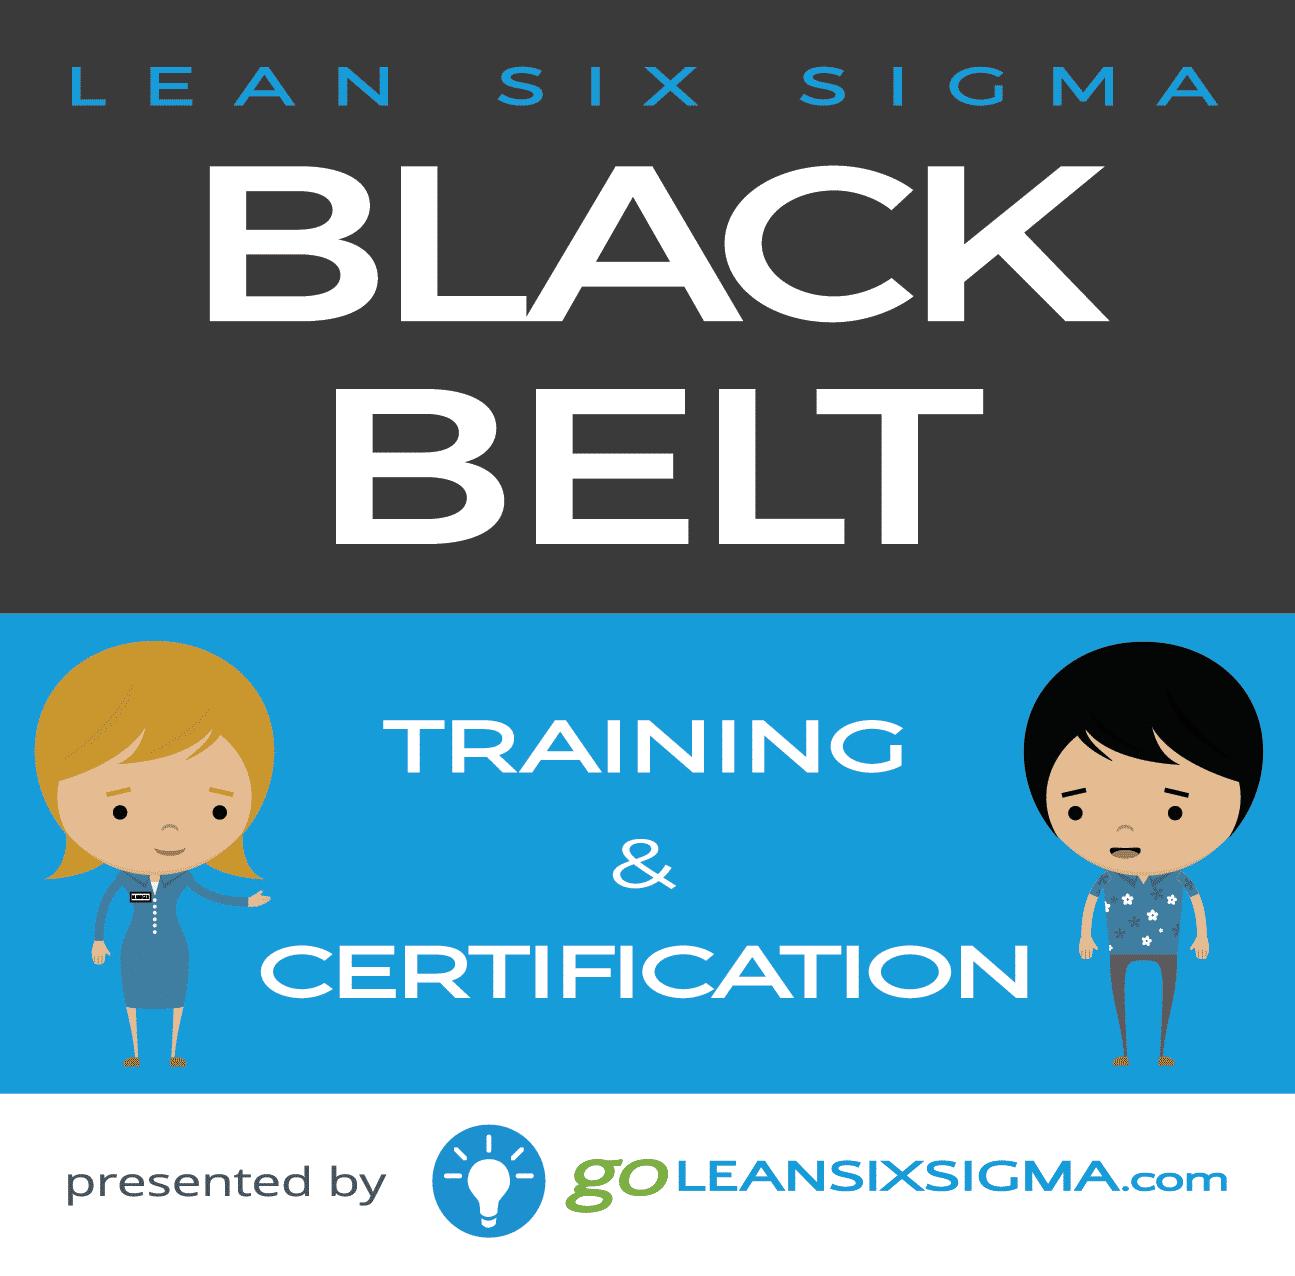 Black Belt Training & Certification